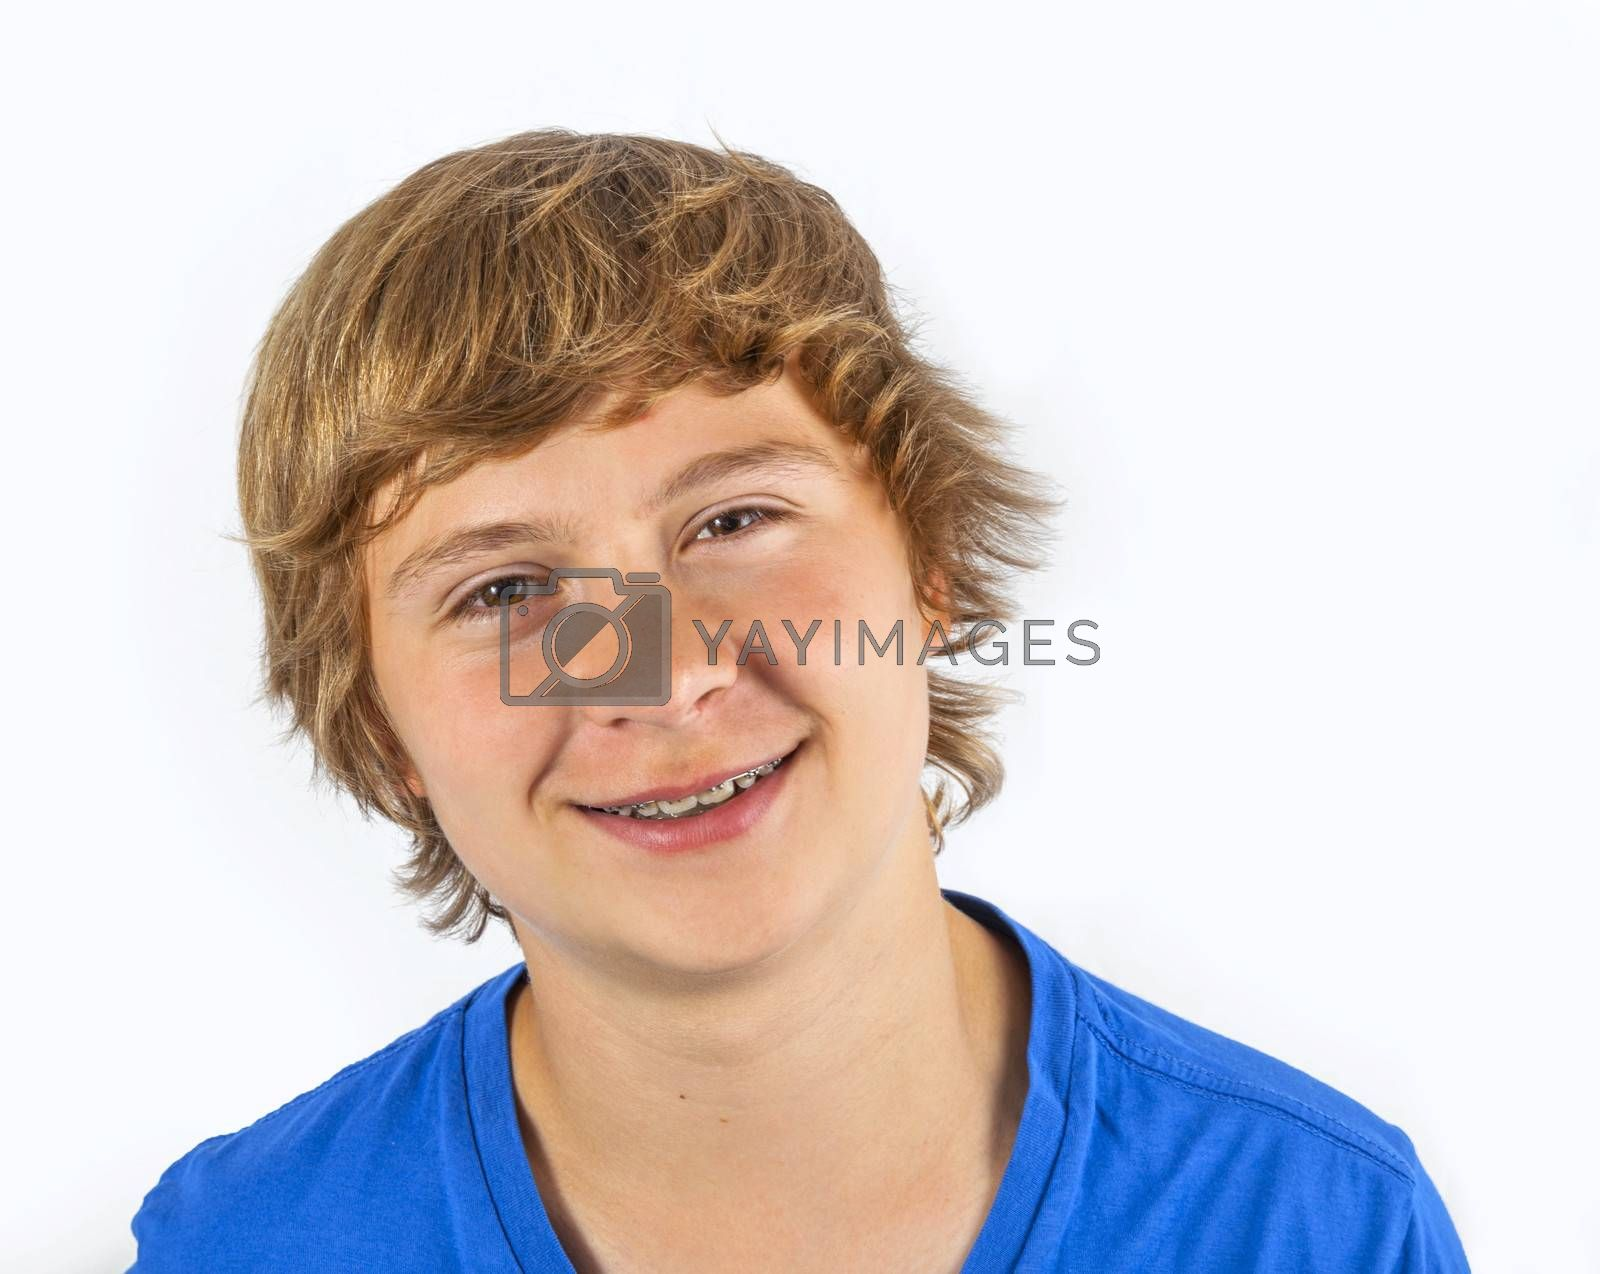 cute handsome boy with blue shirt enjoys posing